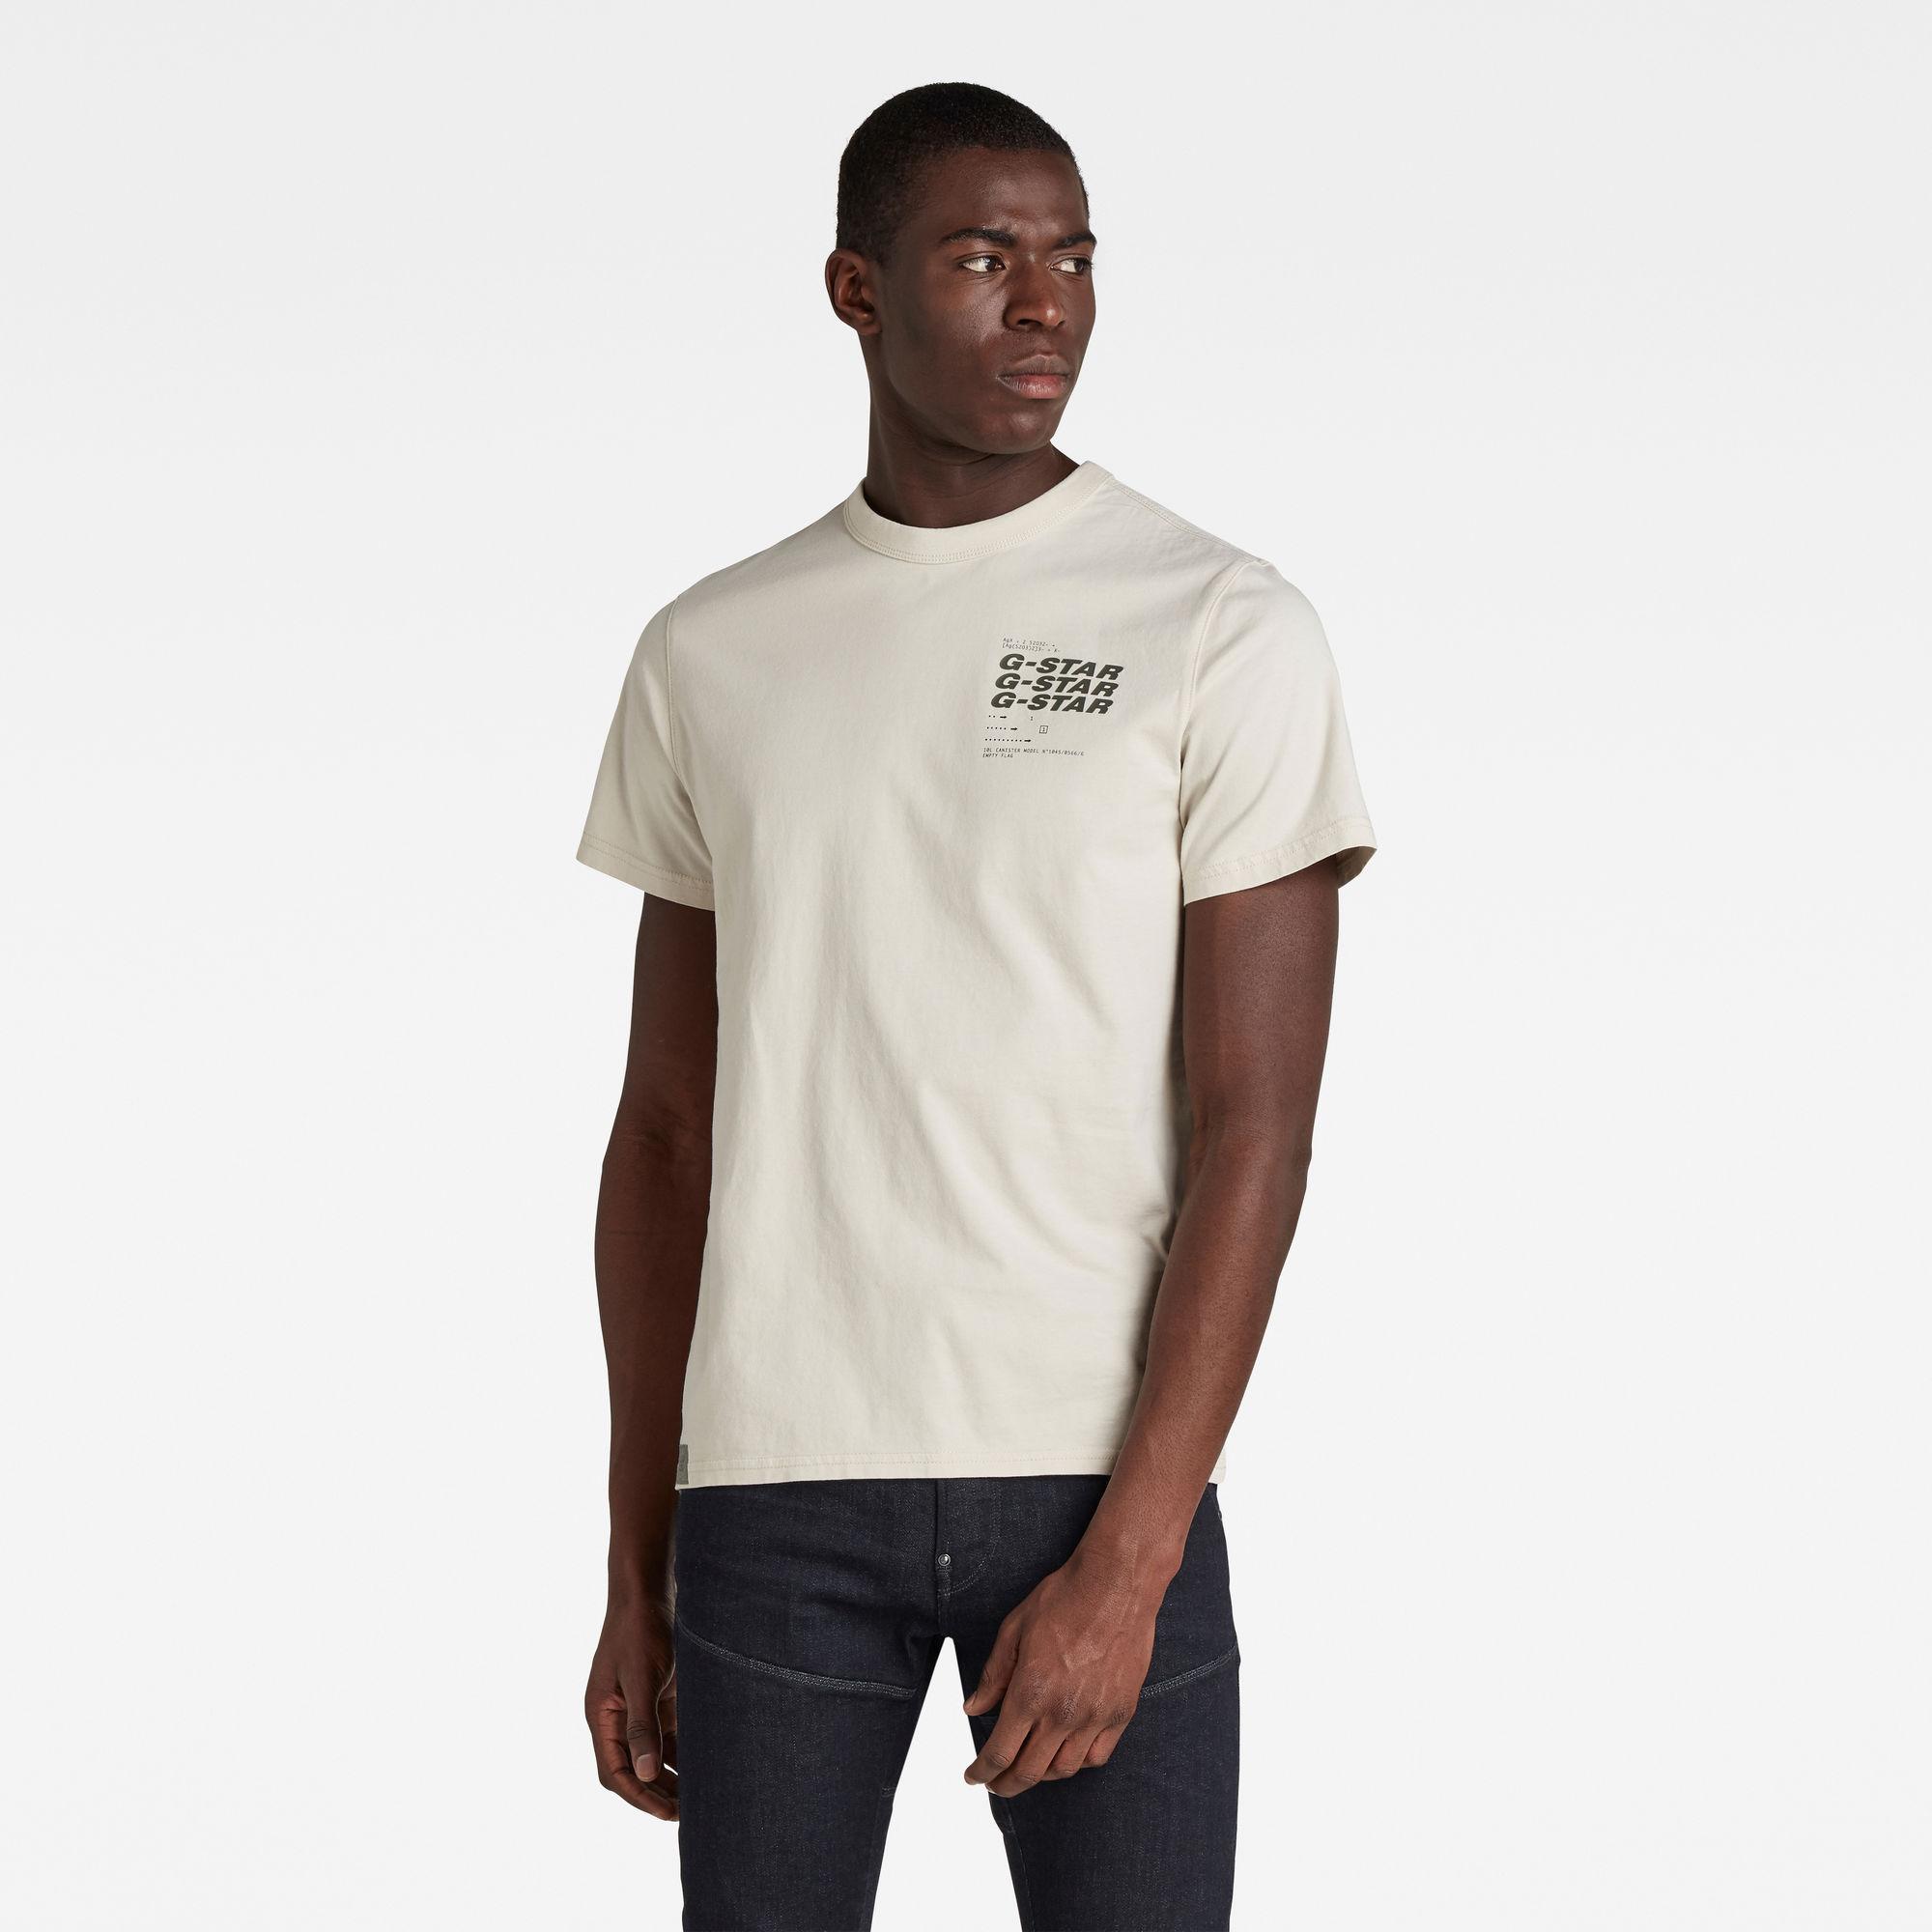 G-Star RAW Heren Big Back Graphic T-Shirt Beige